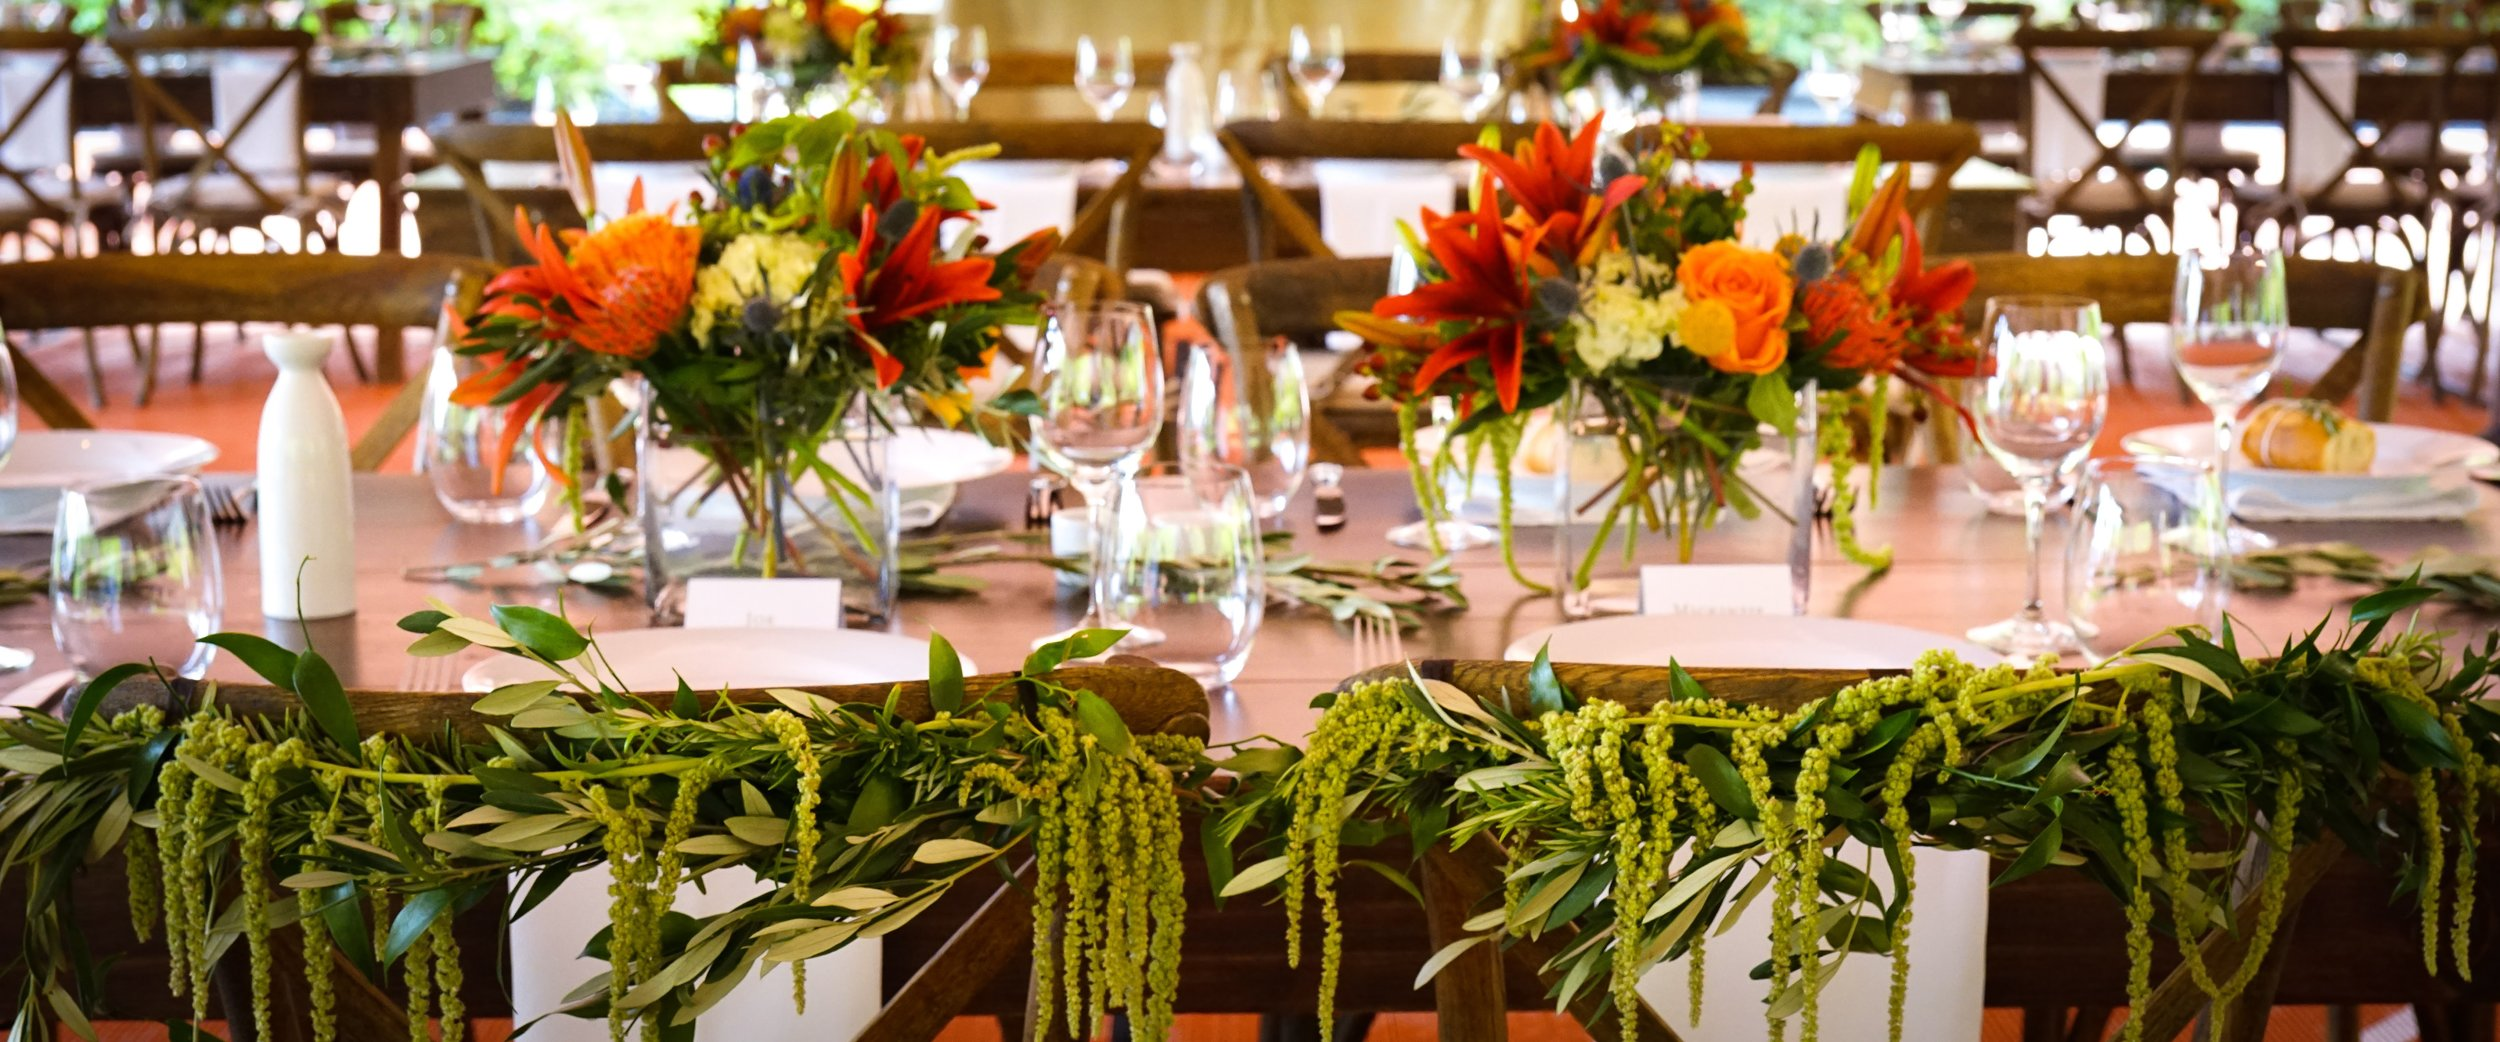 Bridalbliss.com | Portland Wedding | Oregon Event Planning and Design |